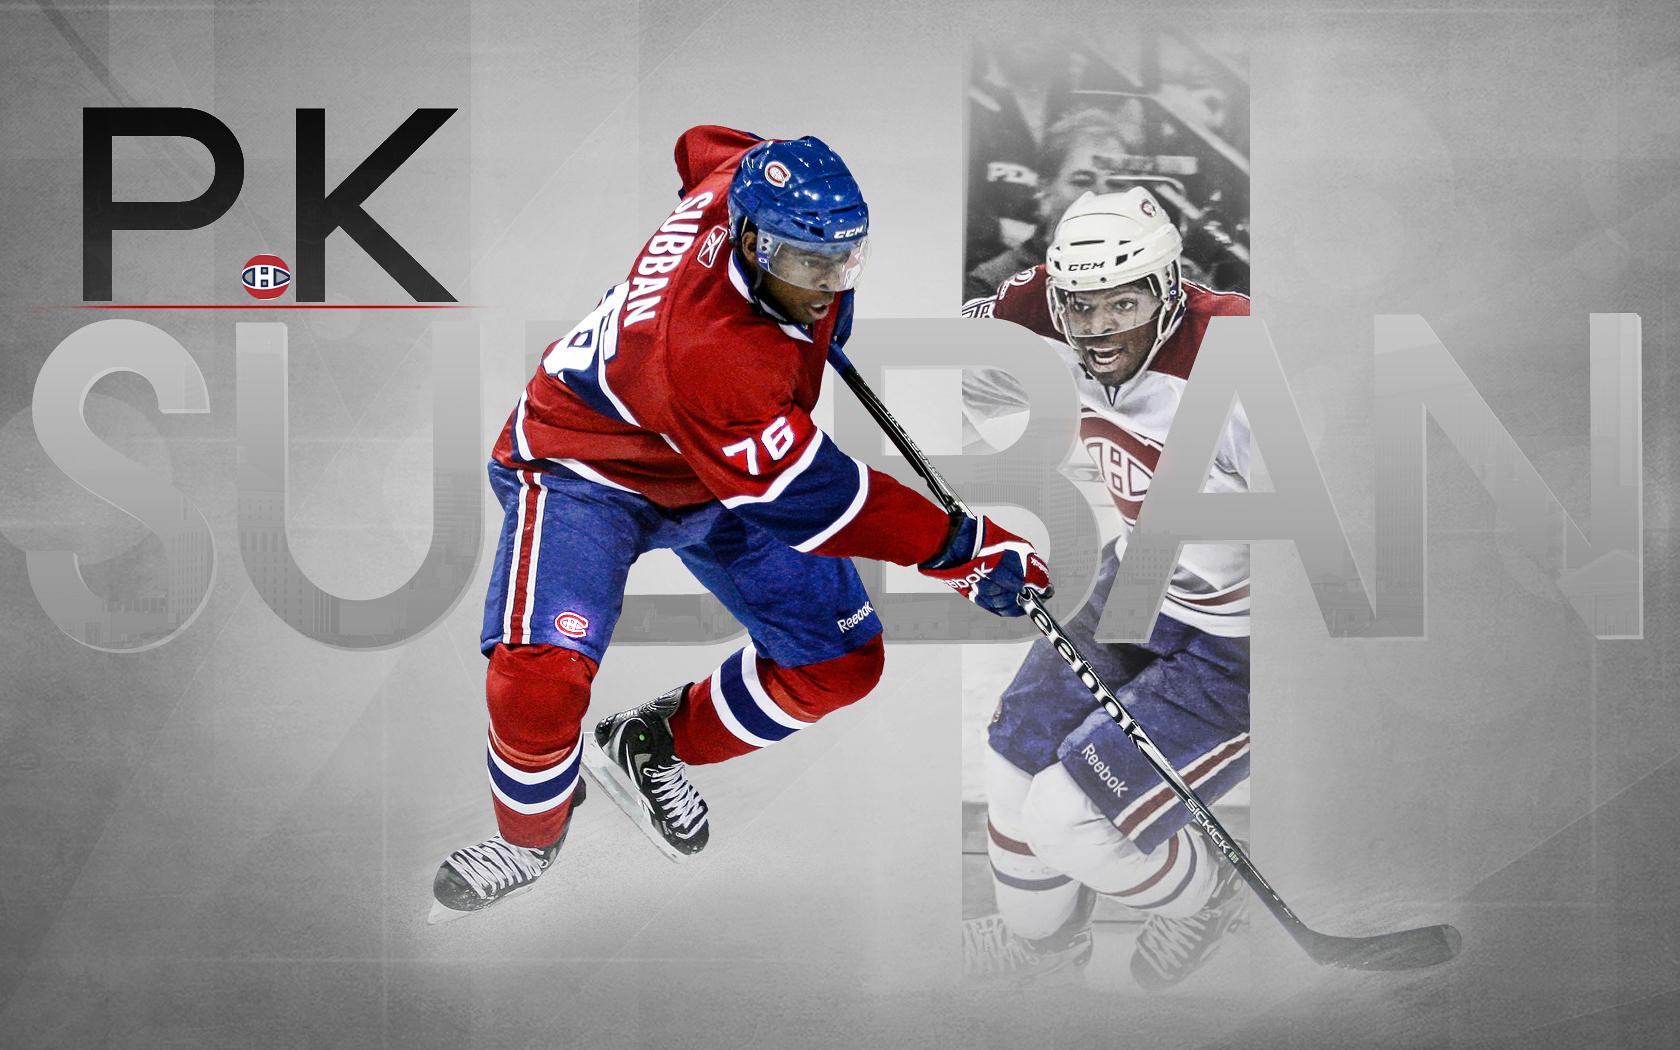 PK Subban Wallpaper Montreal Hockey Canadiens 22 HD 1680x1050